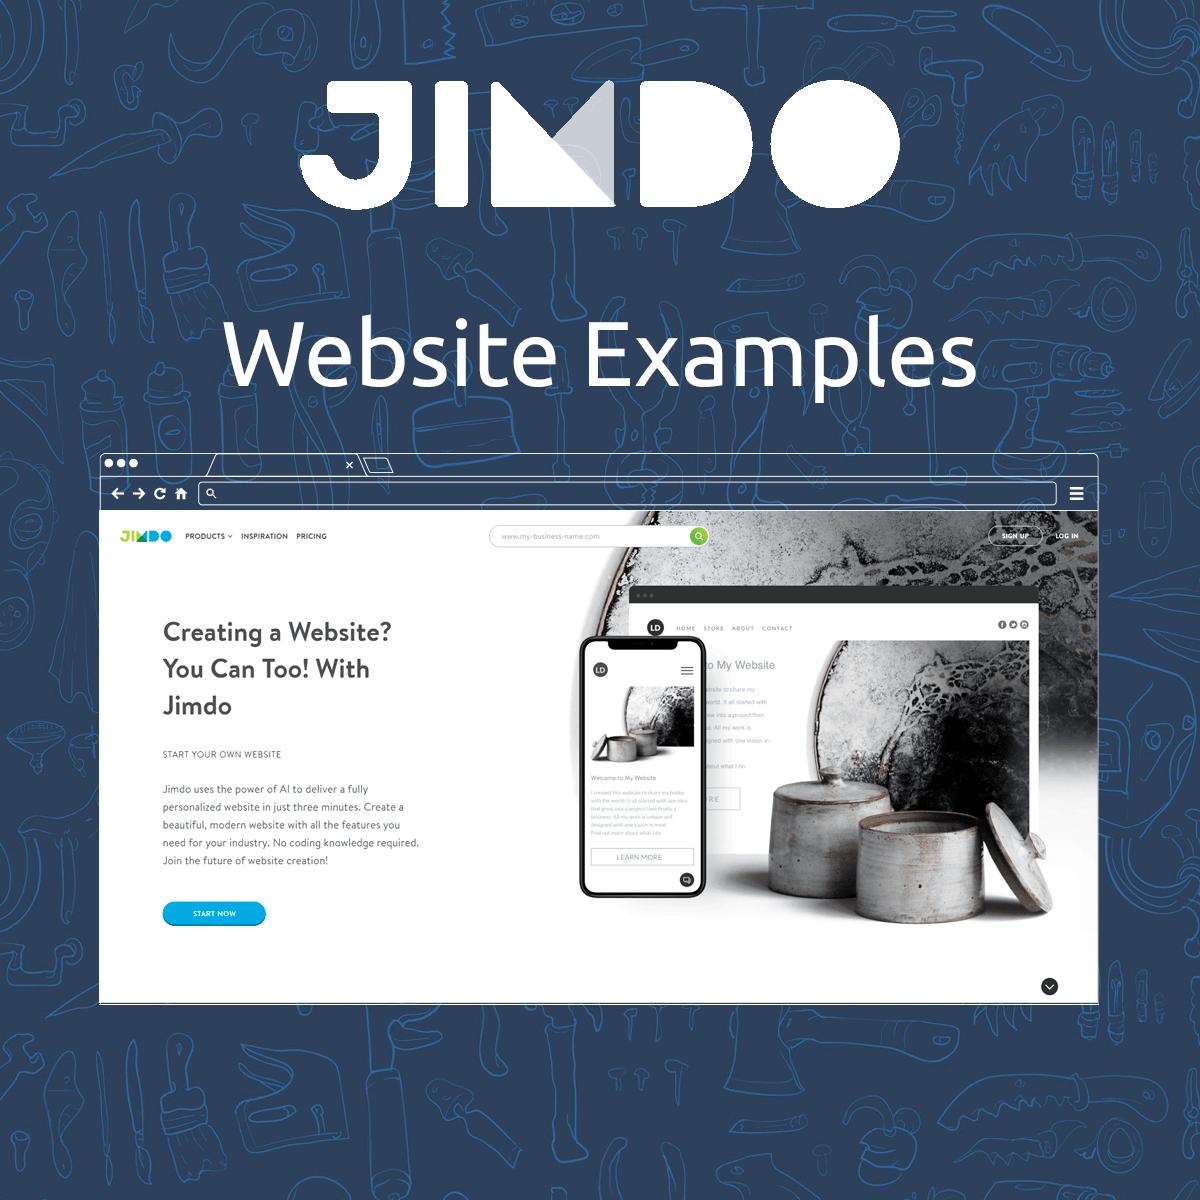 Jimdo Website Examples